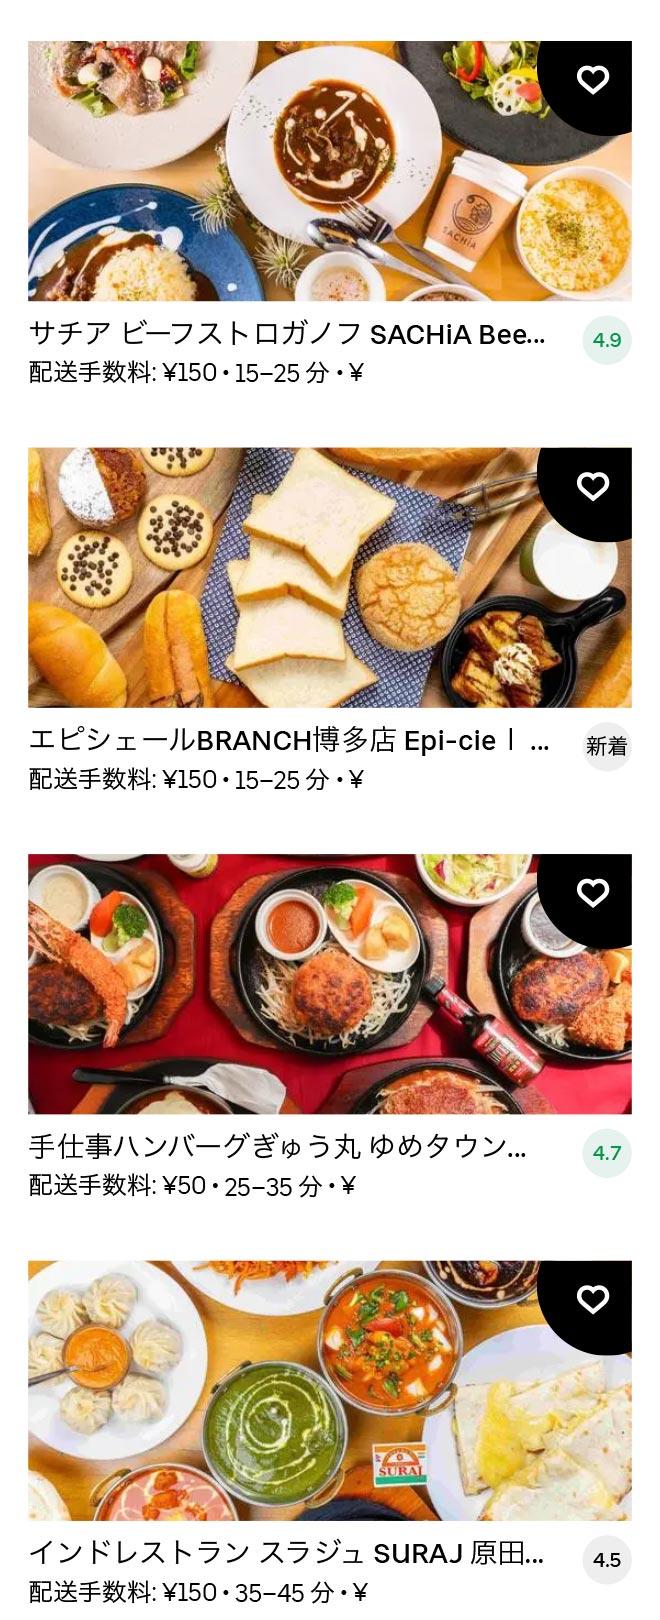 Hakozaki menu 2101 12